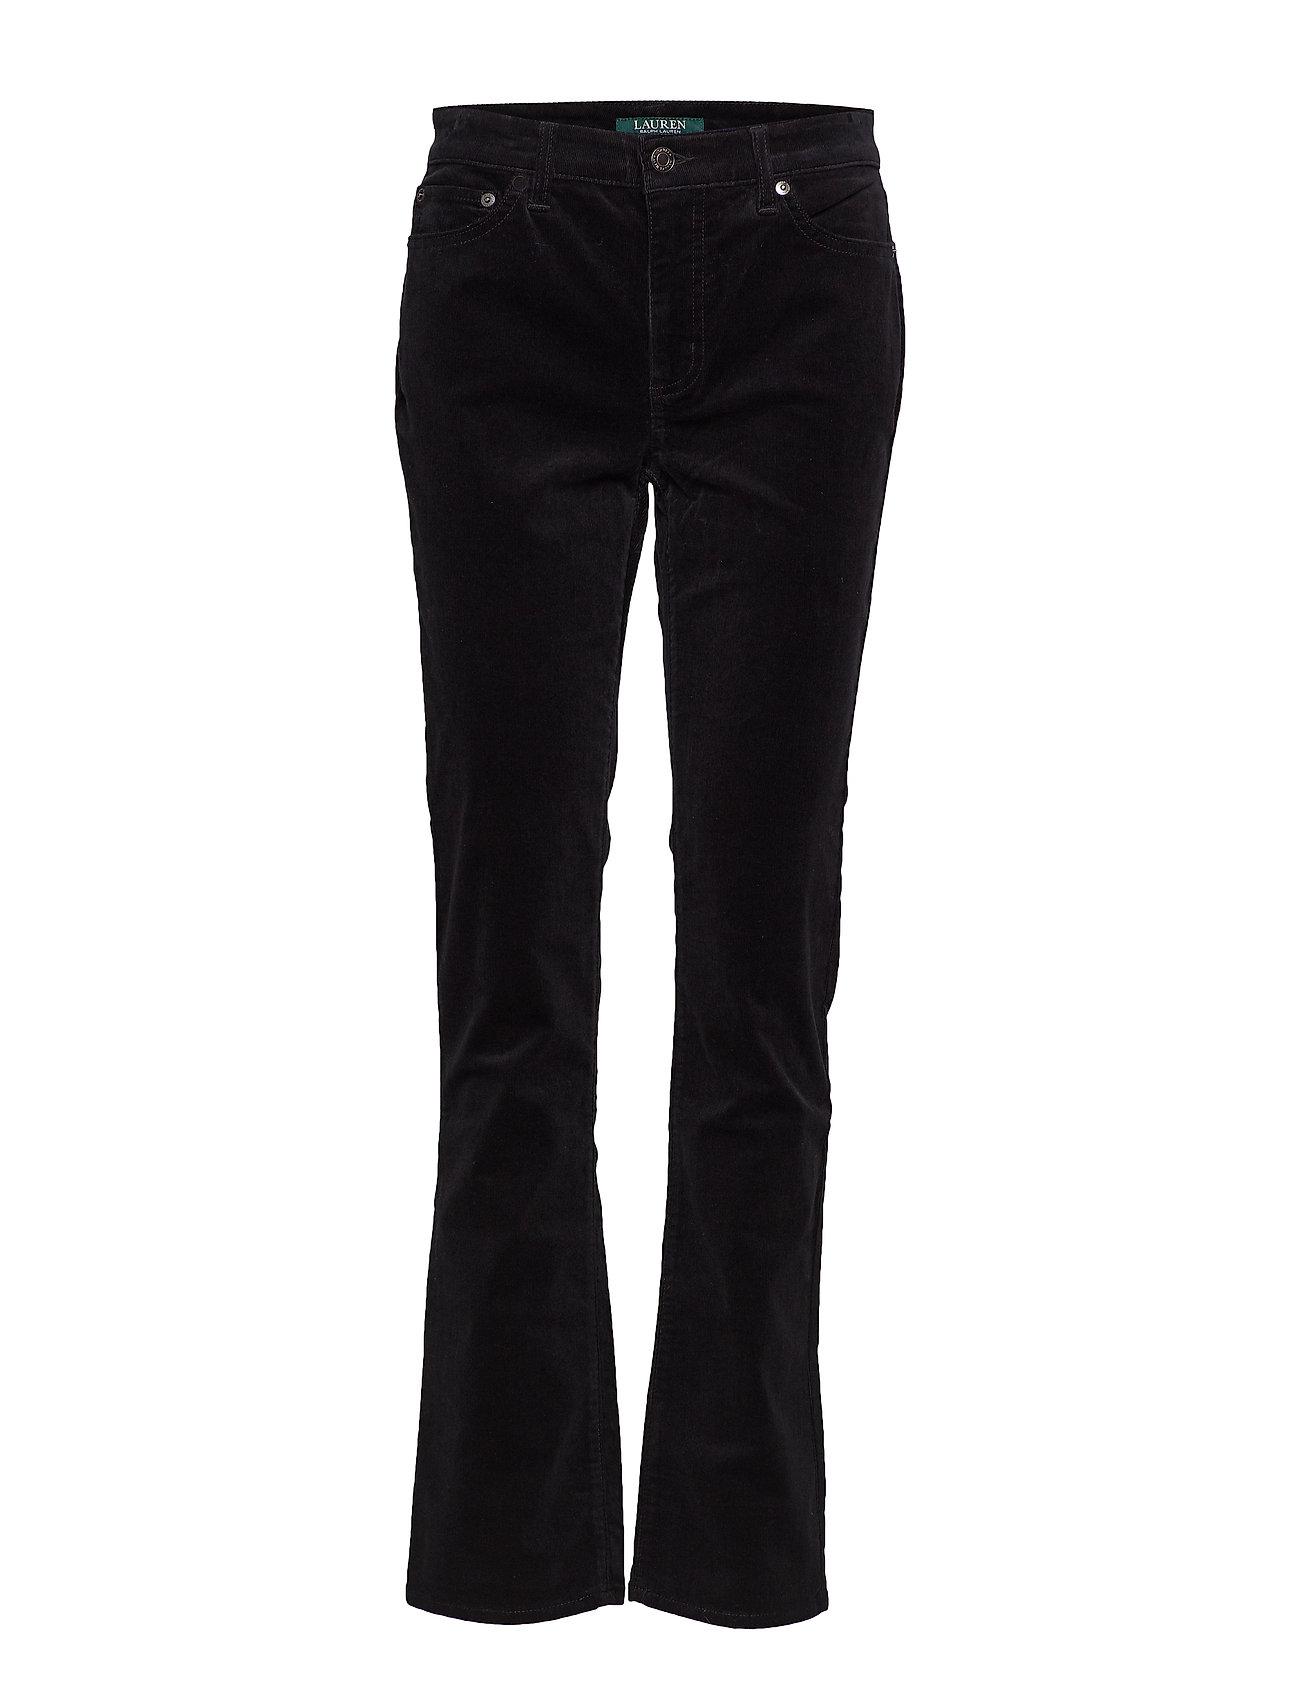 Lauren Ralph Lauren Premier Straight Corduroy Jean - POLO BLACK